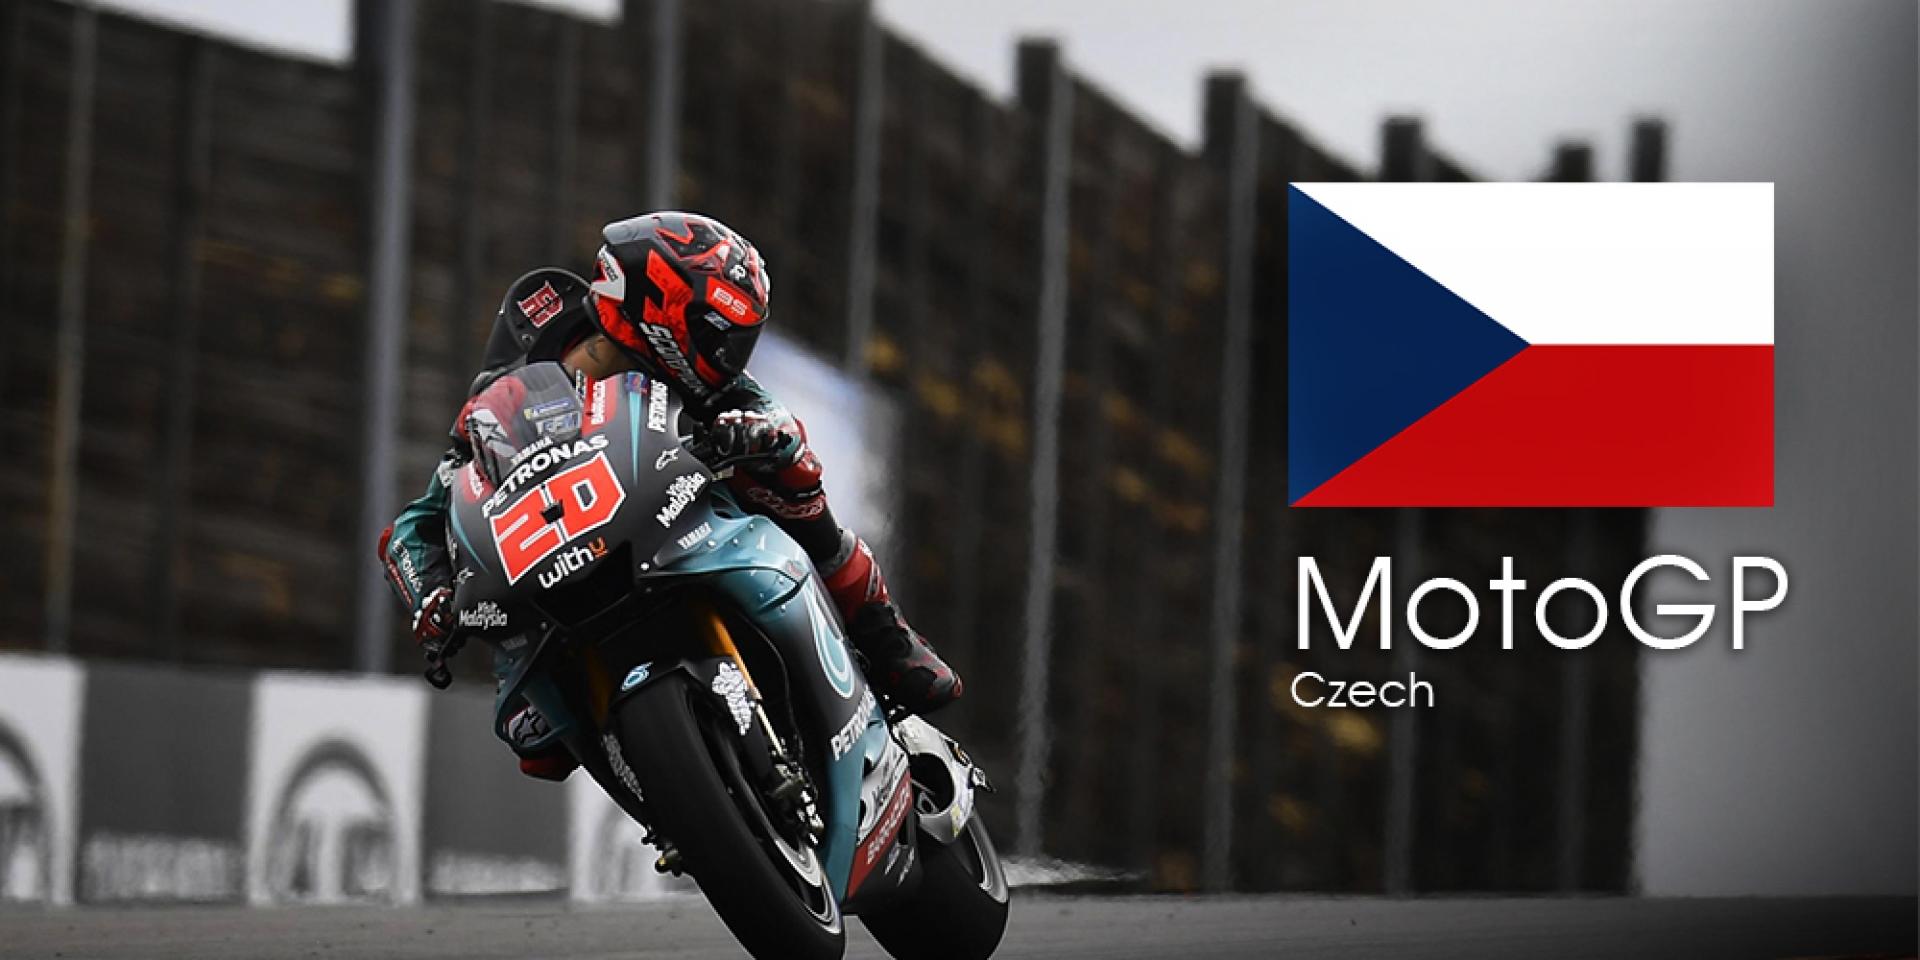 MotoGP 2019 捷克站 轉播時間